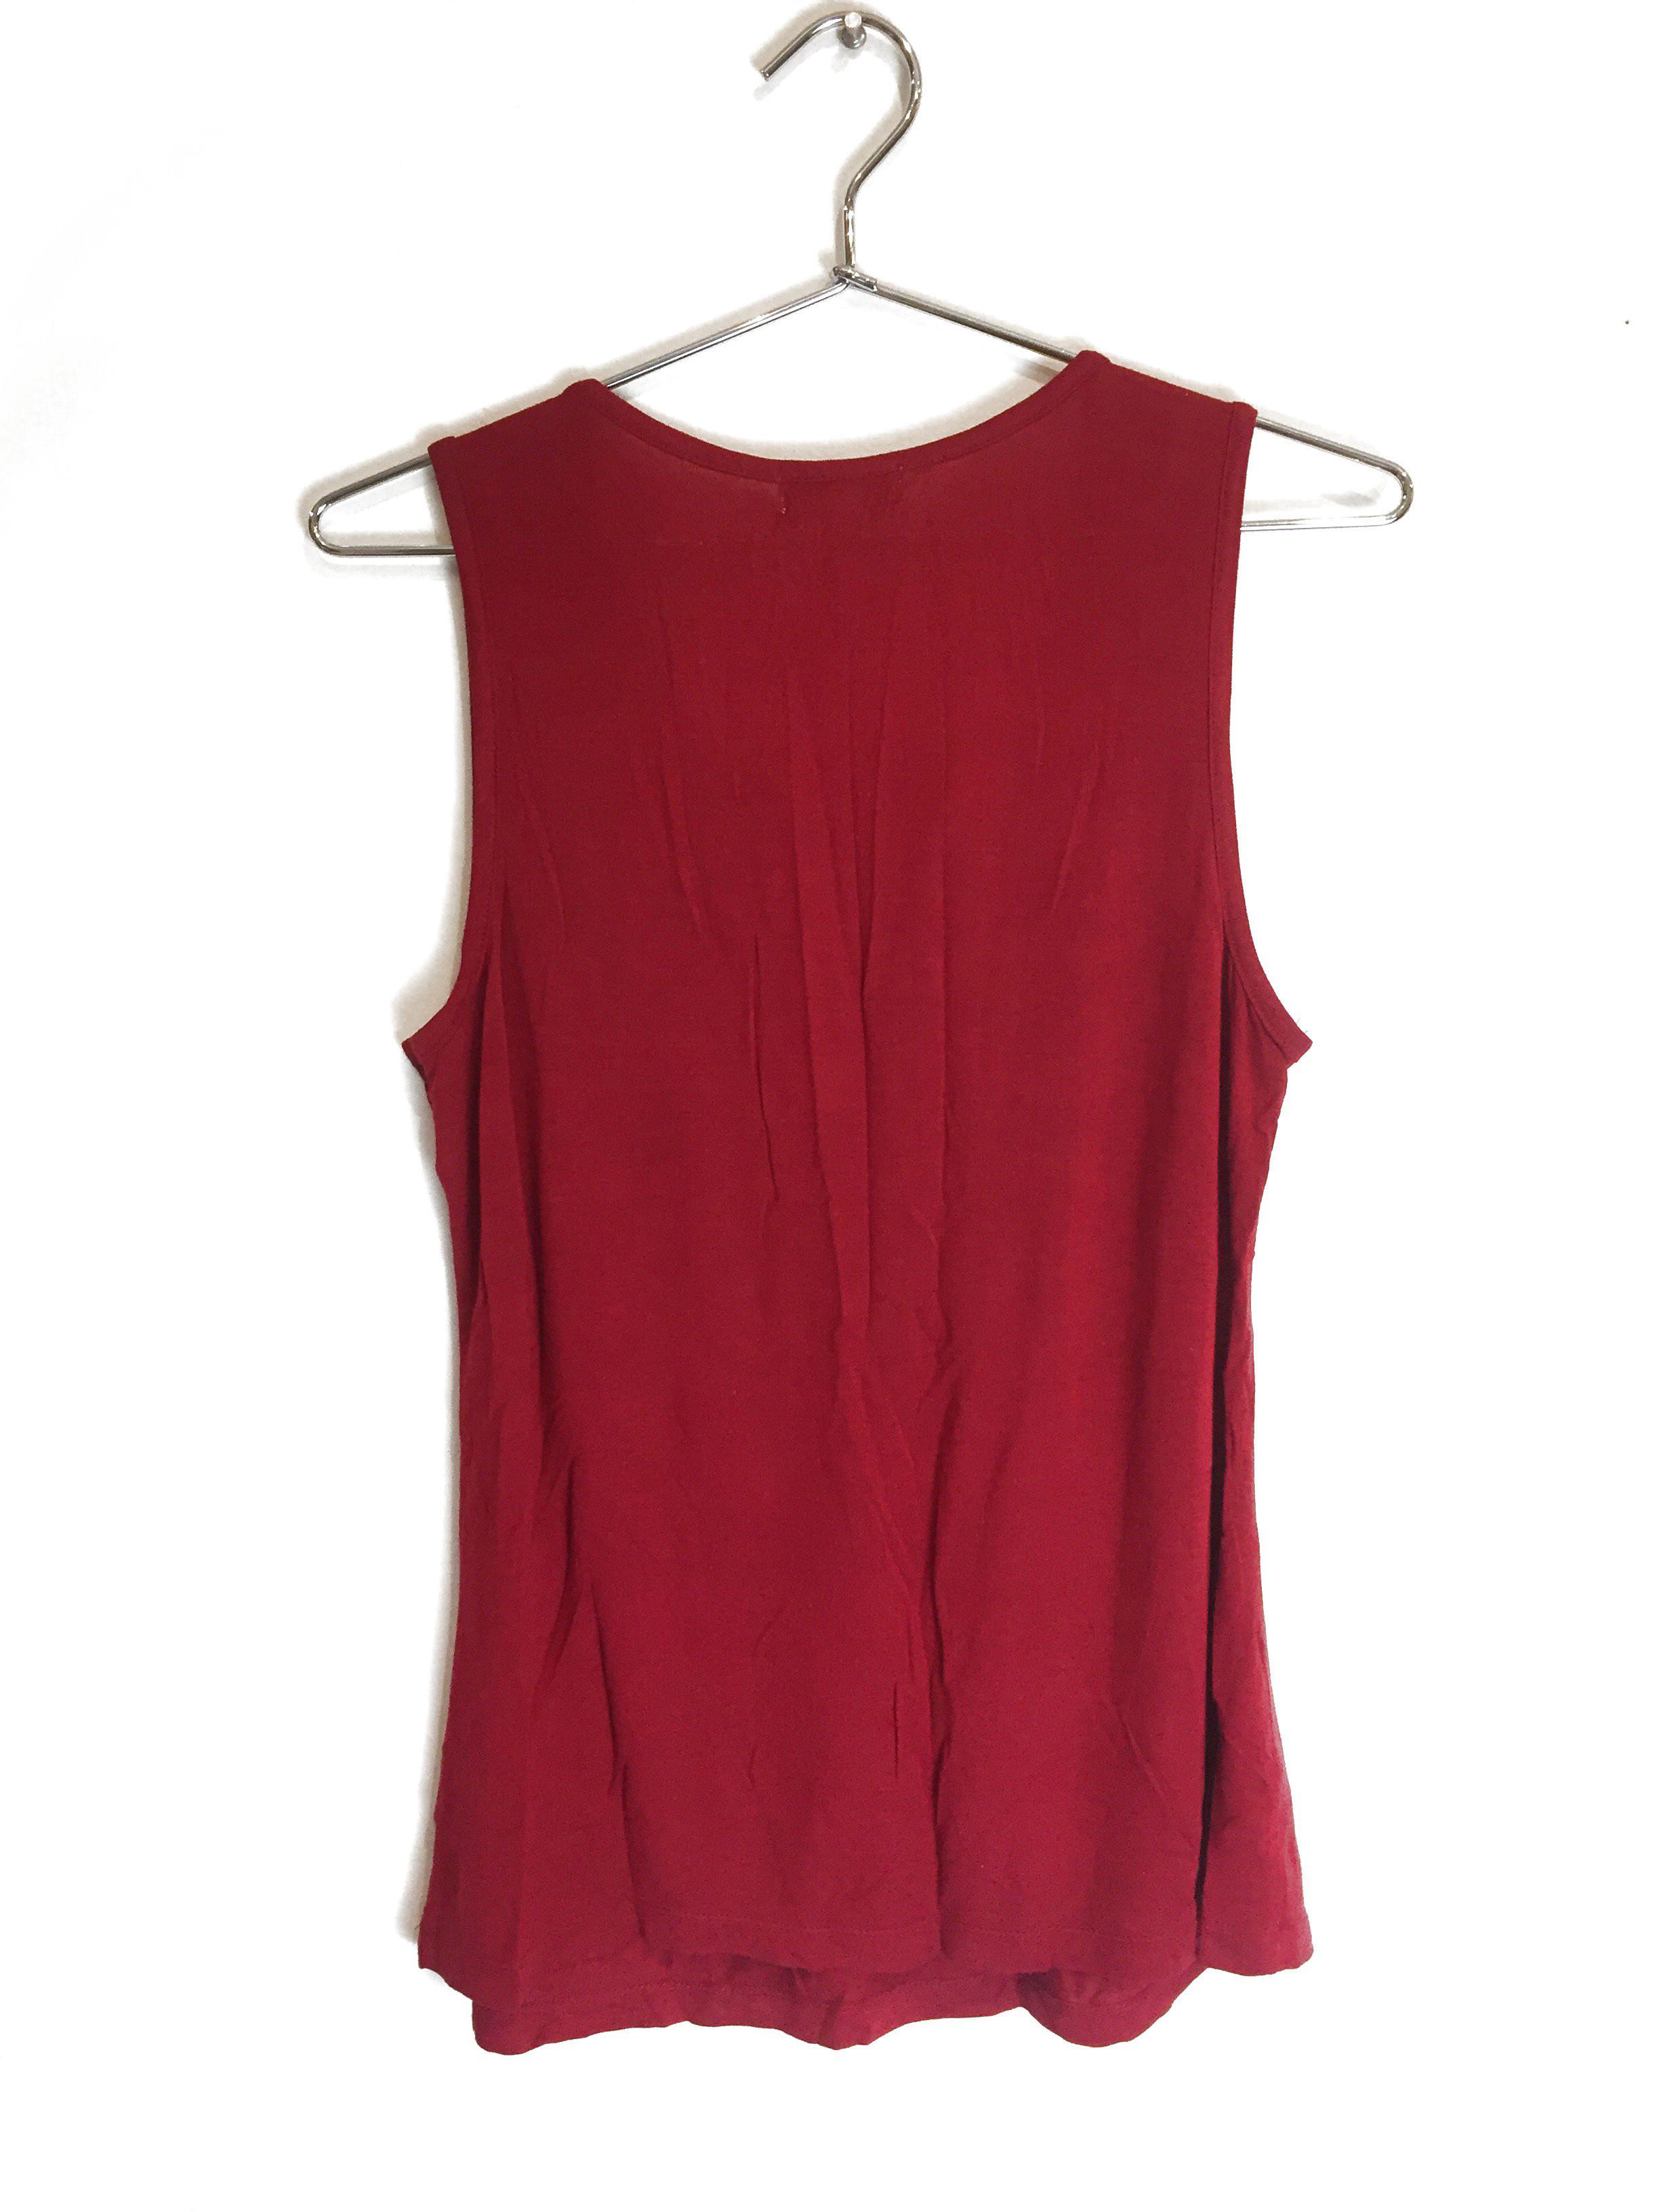 New One World Womens Sleeveless Crochet Tank Top Blouse Dark Red Plus Size $45